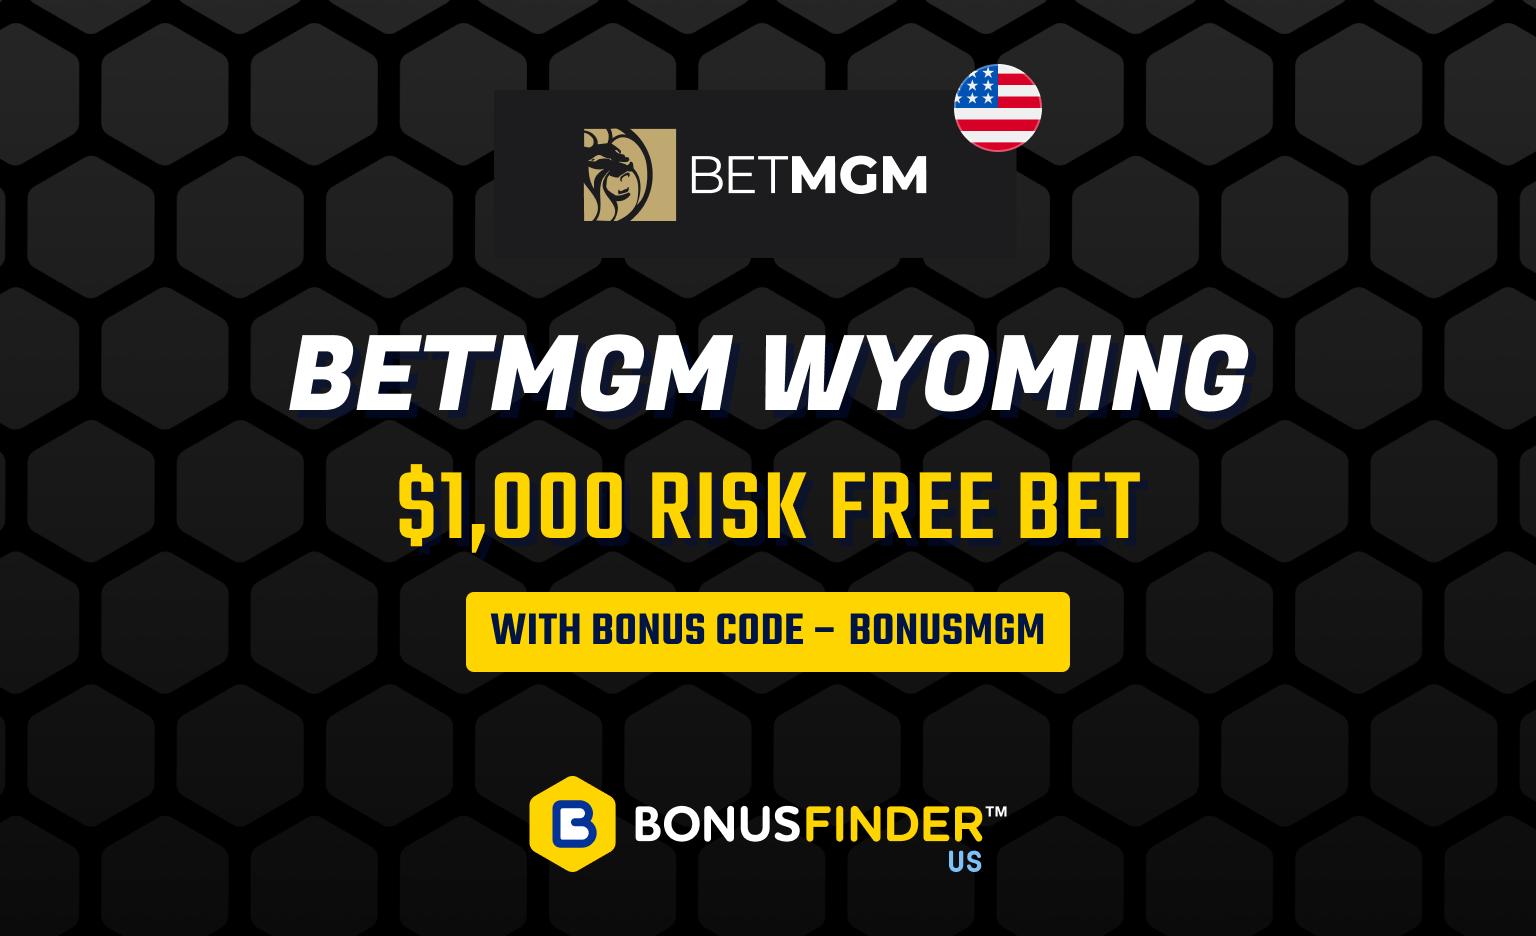 BetMGM Wyoming